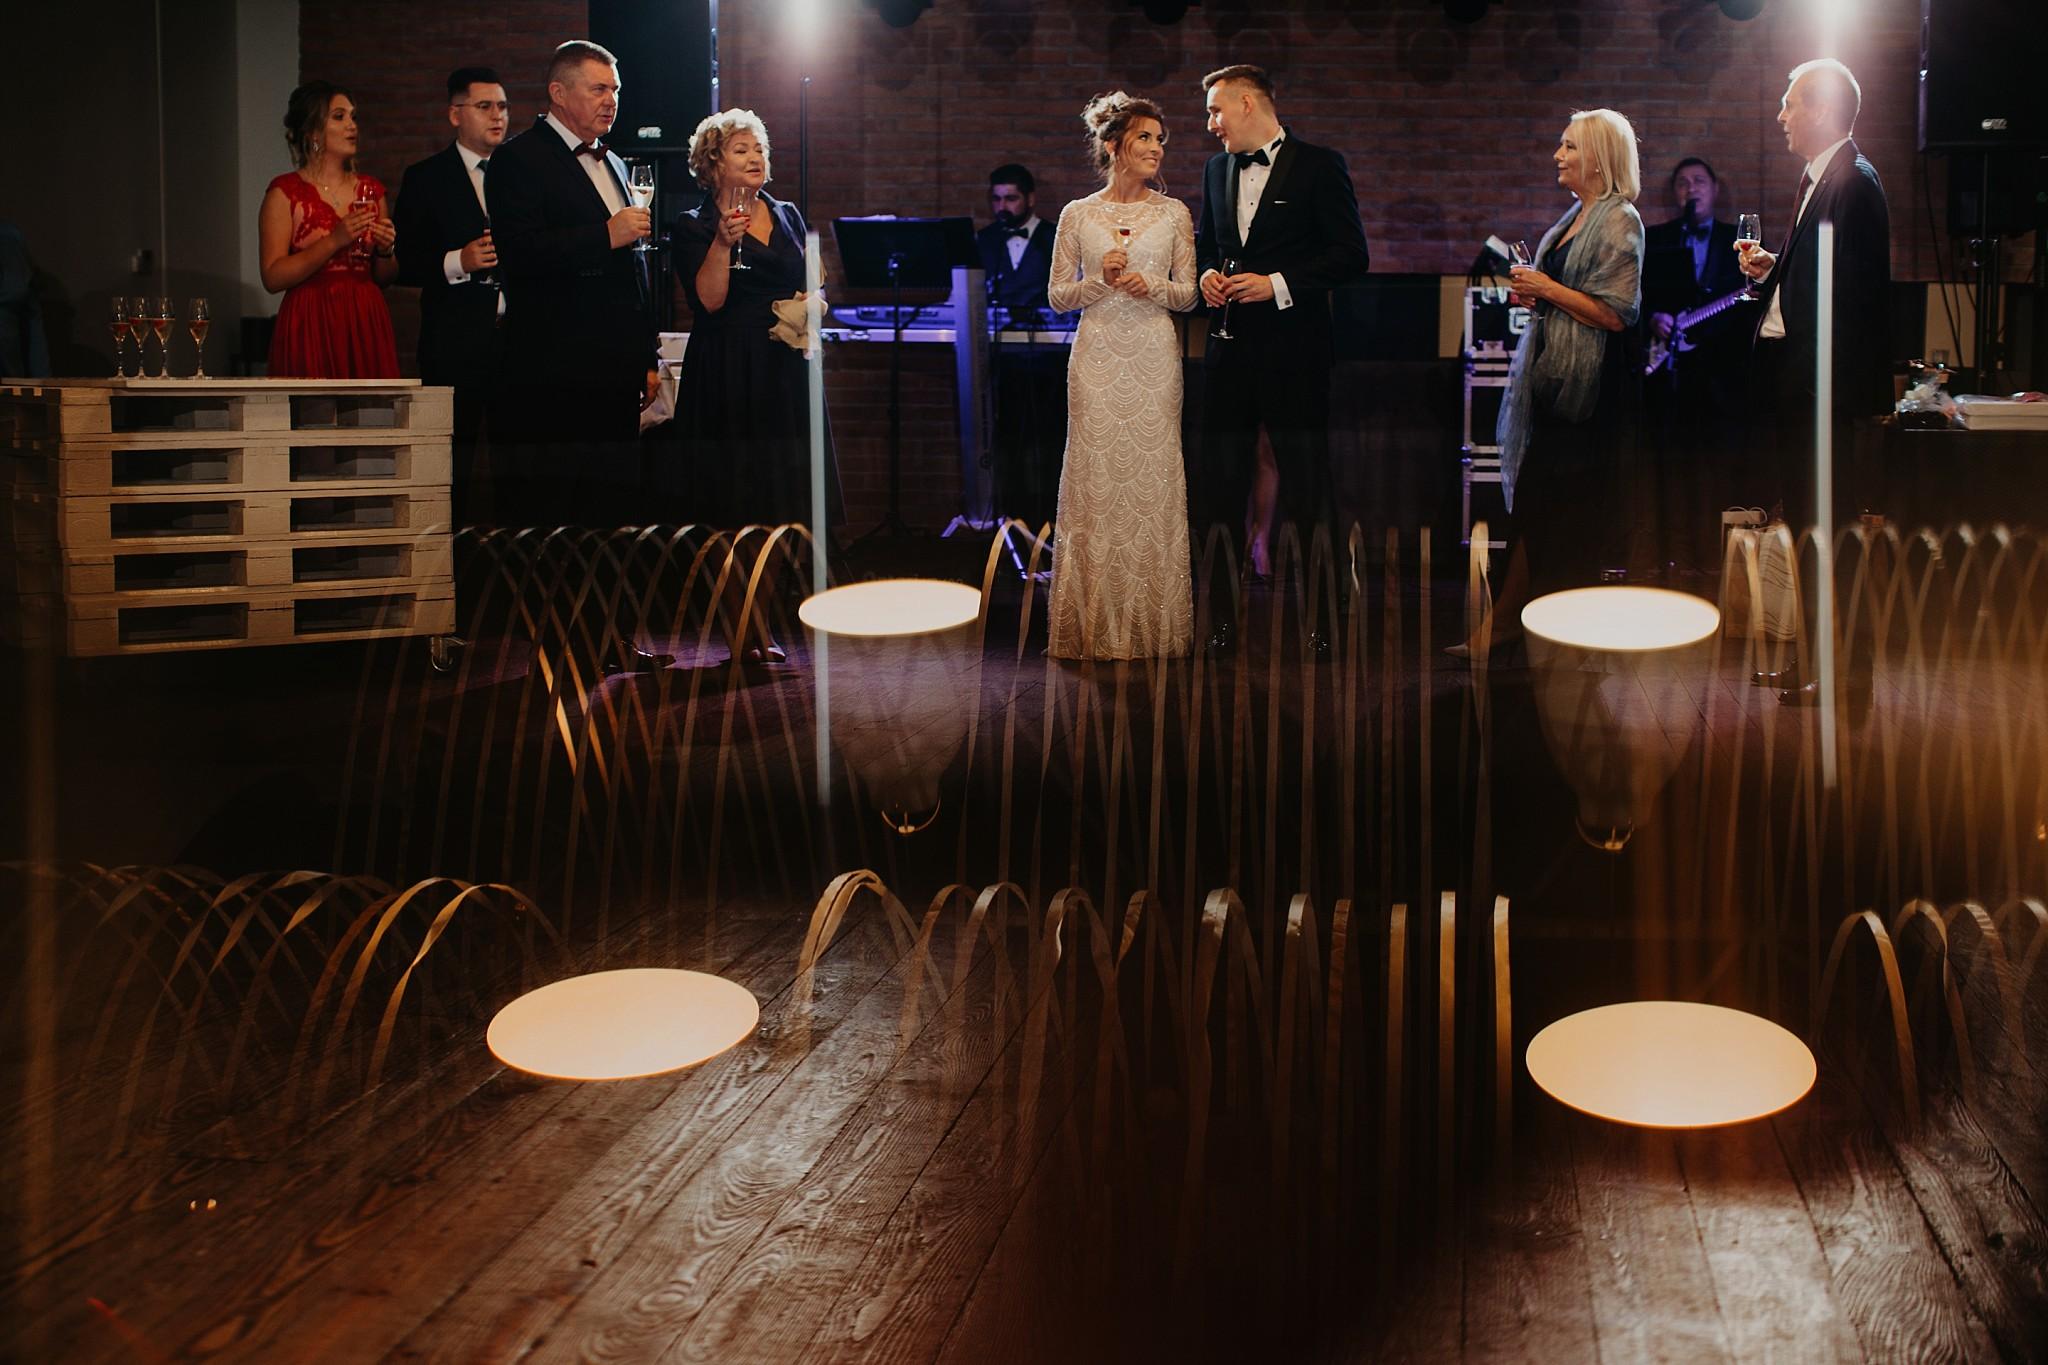 fotograf poznan wesele dobra truskawka piekne wesele pod poznaniem wesele w dobrej truskawce piekna para mloda slub marzen slub koronawirus slub listopad wesele koronawirus 294